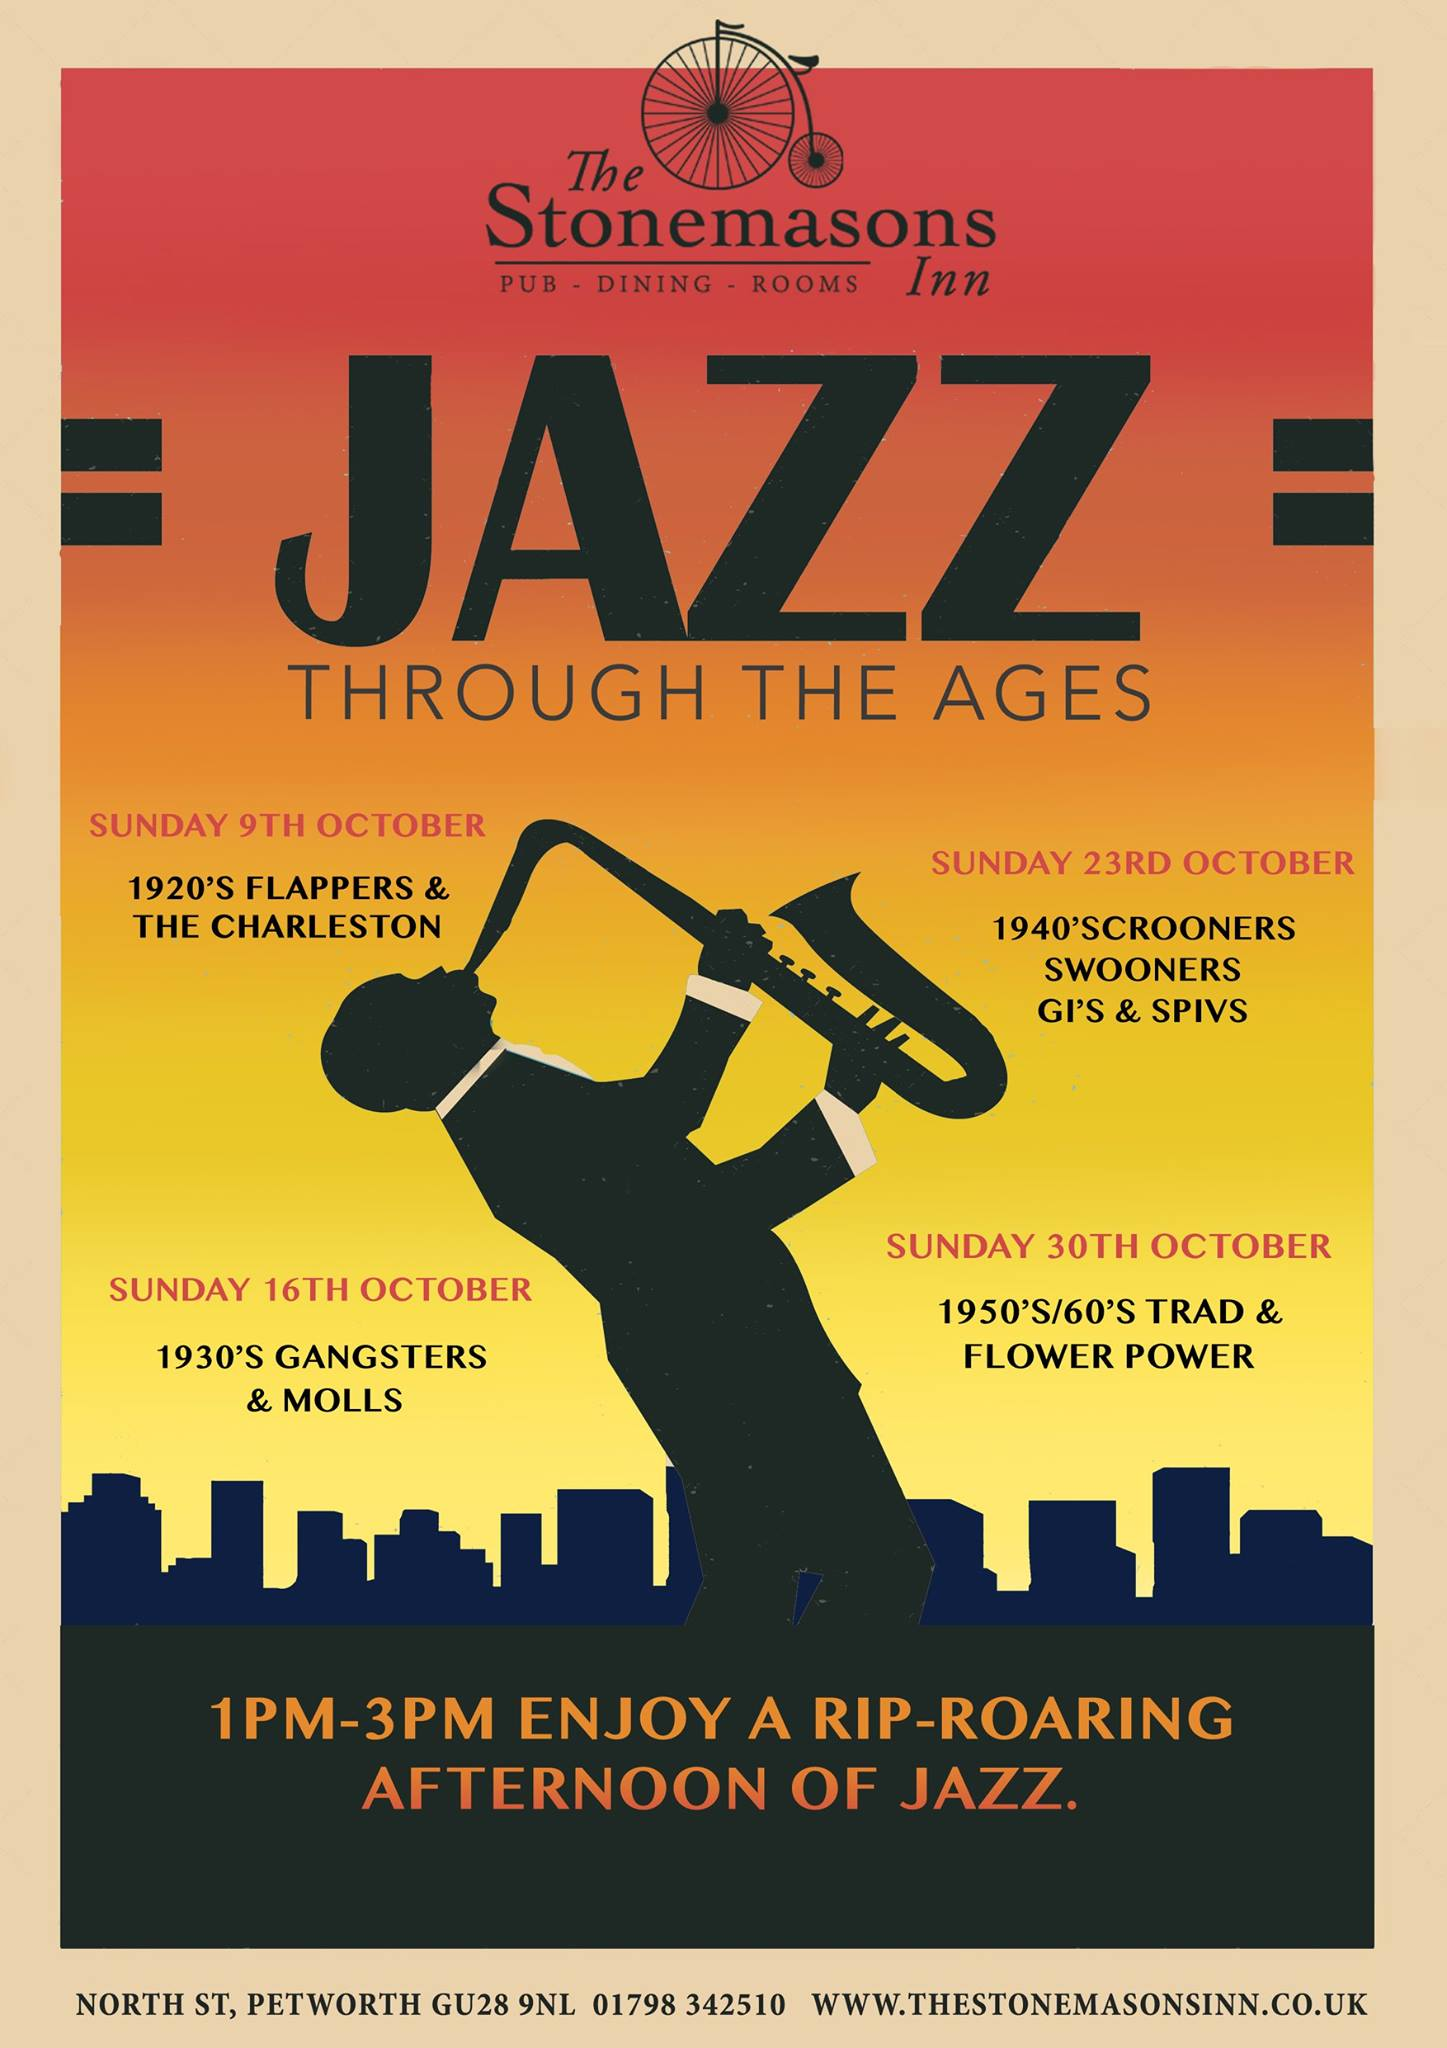 Jazz Afternoon at The Stonemasons Inn